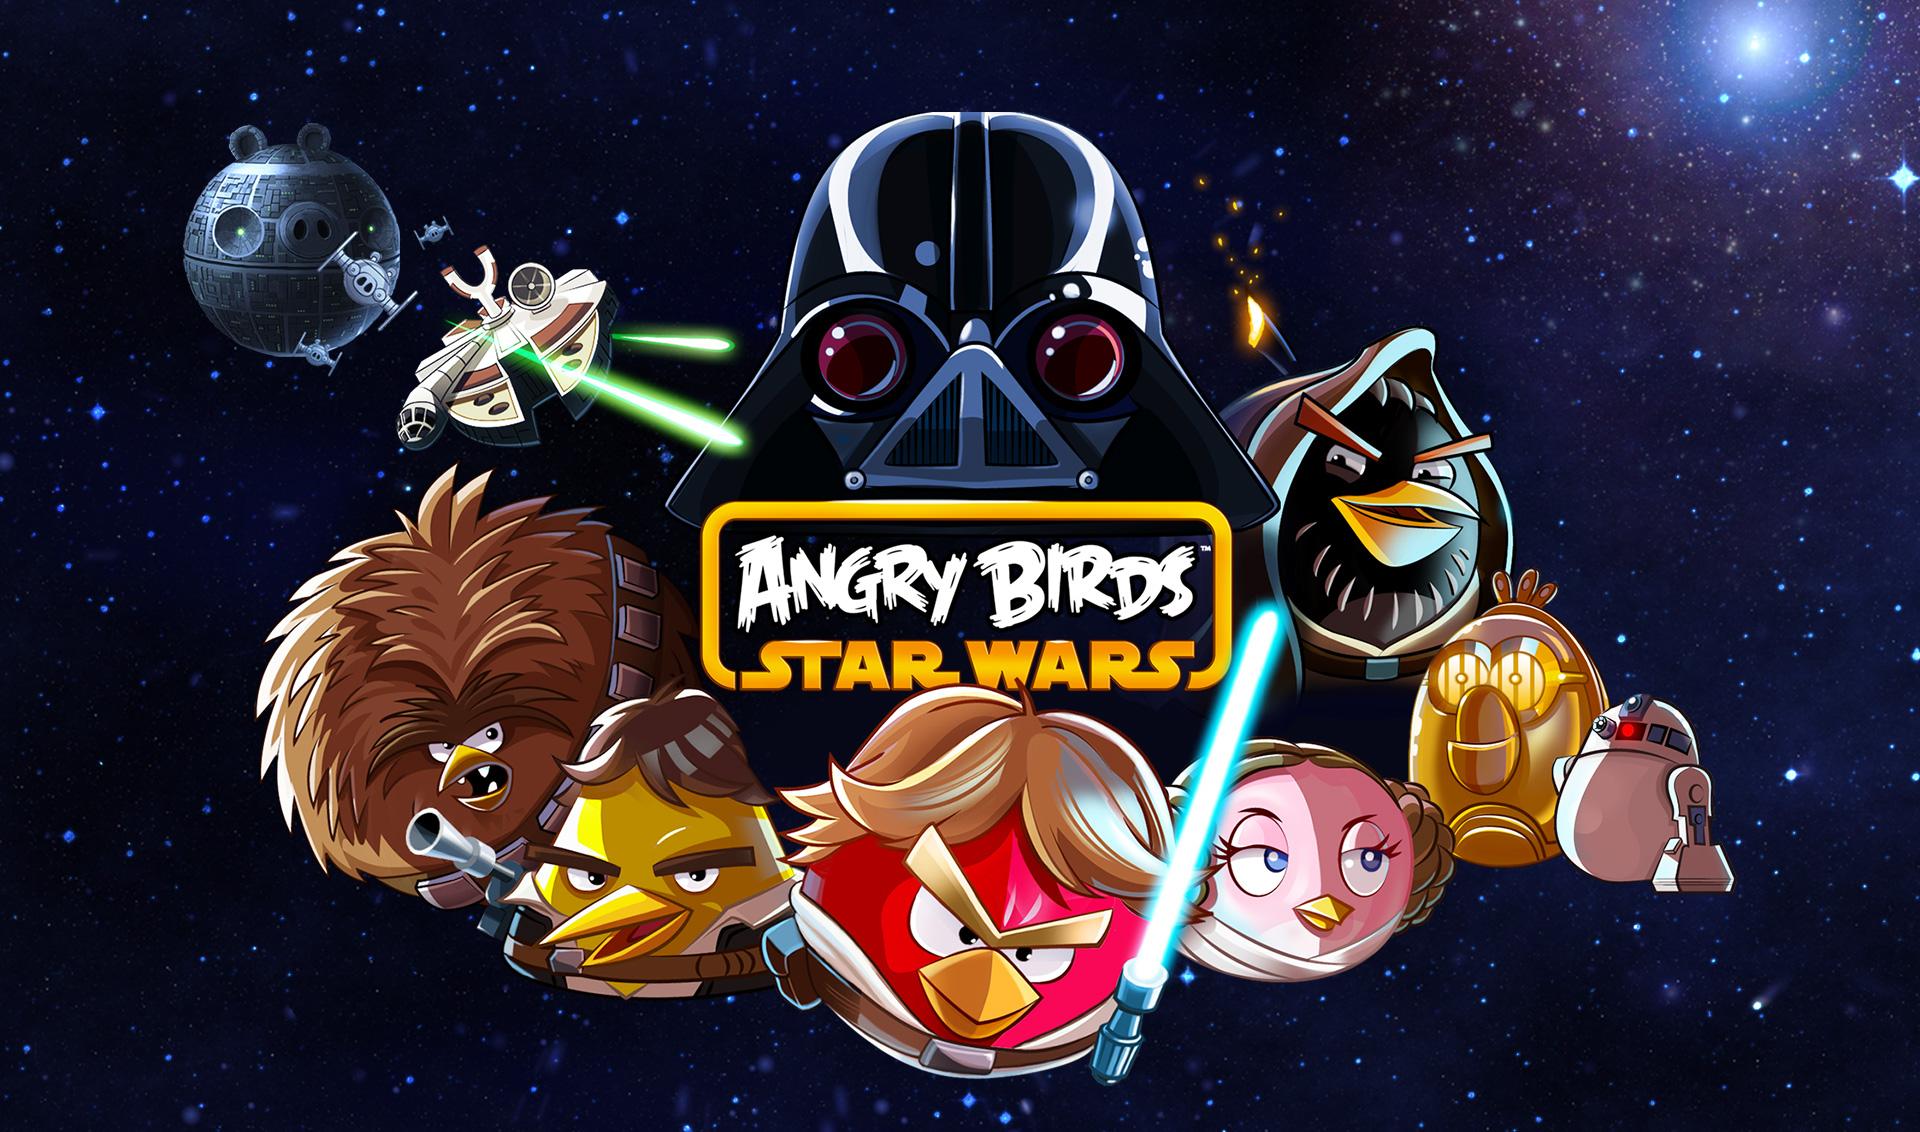 Angry Birds Star Wars -pelilogo